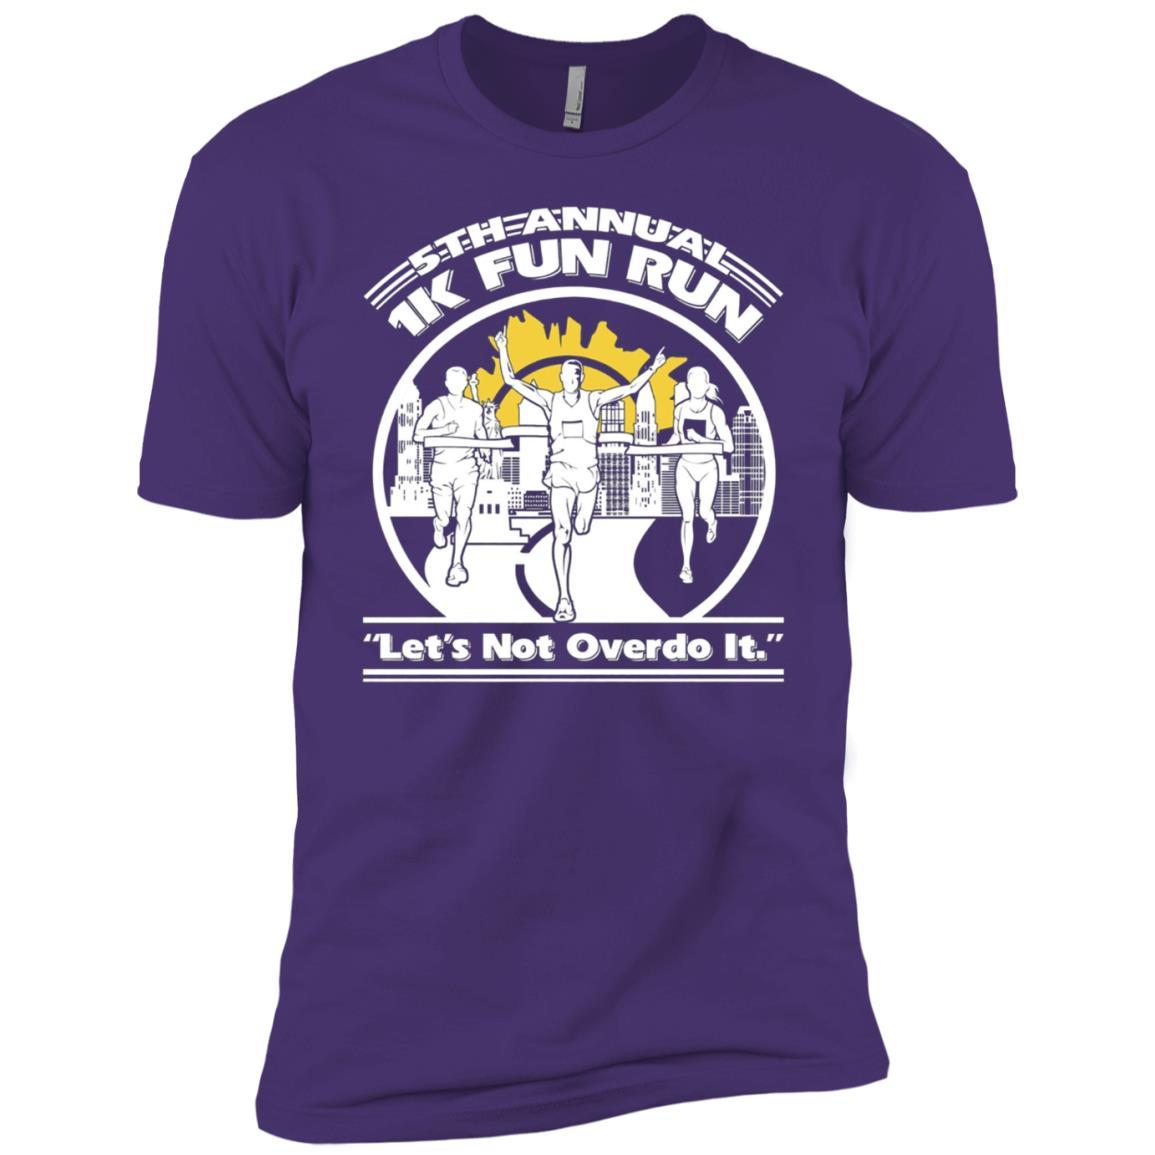 1K Fun Run 5th Annual Men Short Sleeve T-Shirt